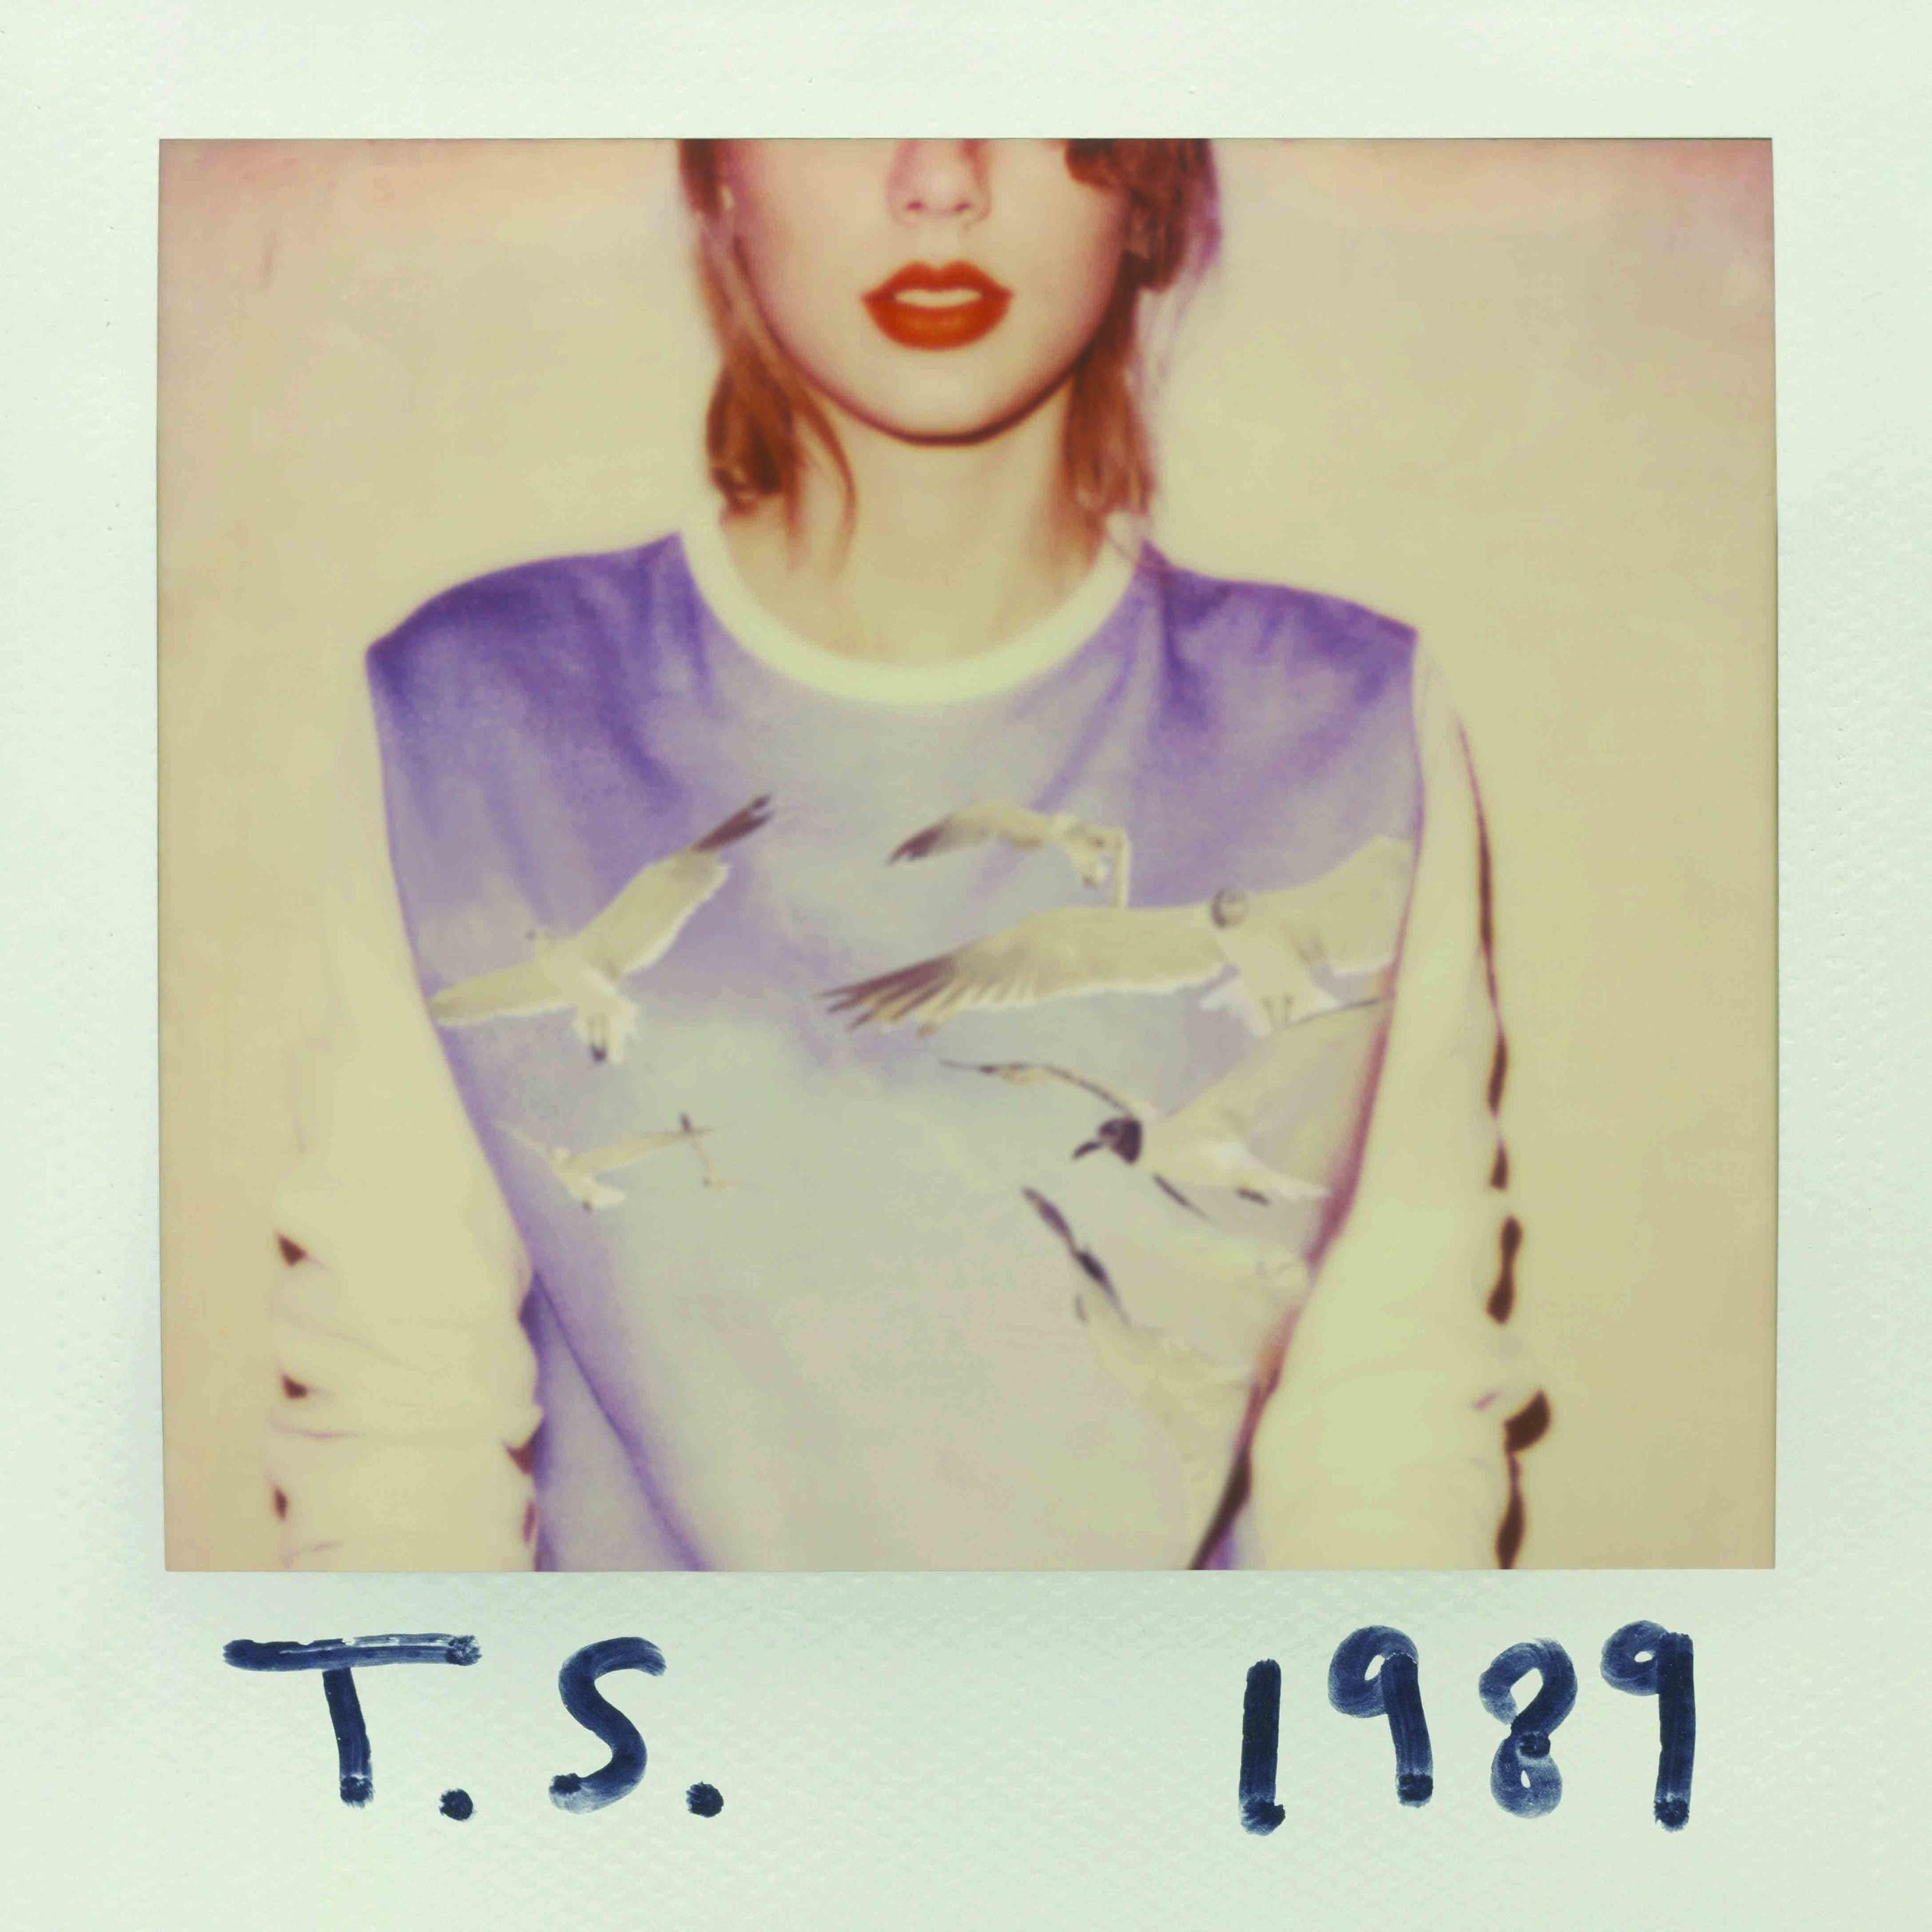 Taylor Swift's 1989 album cover. (Big Machine Records)